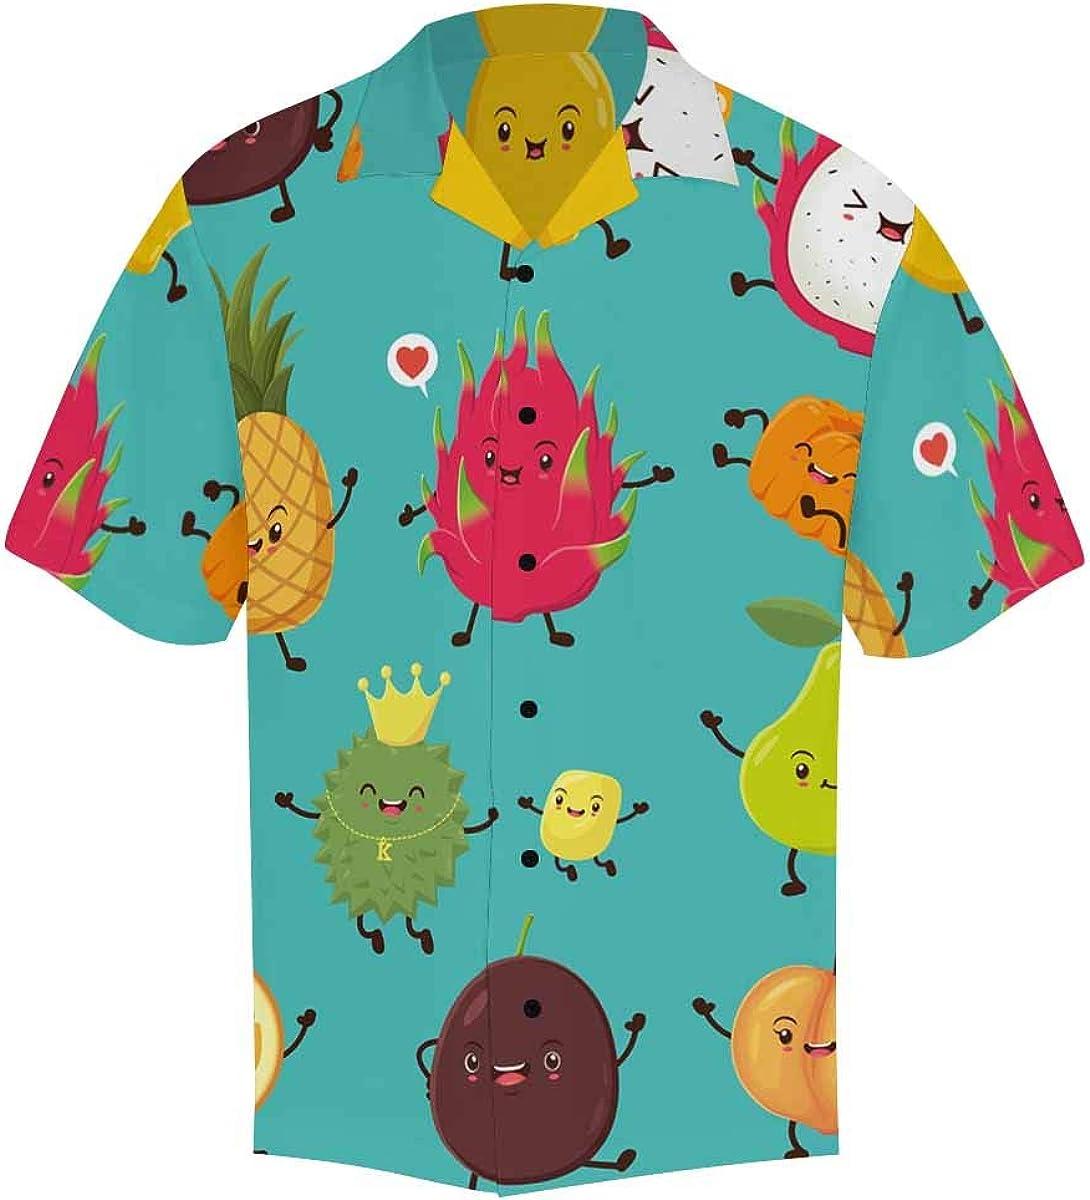 InterestPrint Men's Casual Button Down Short Sleeve Donuts Colorful Hawaiian Shirt (S-5XL)